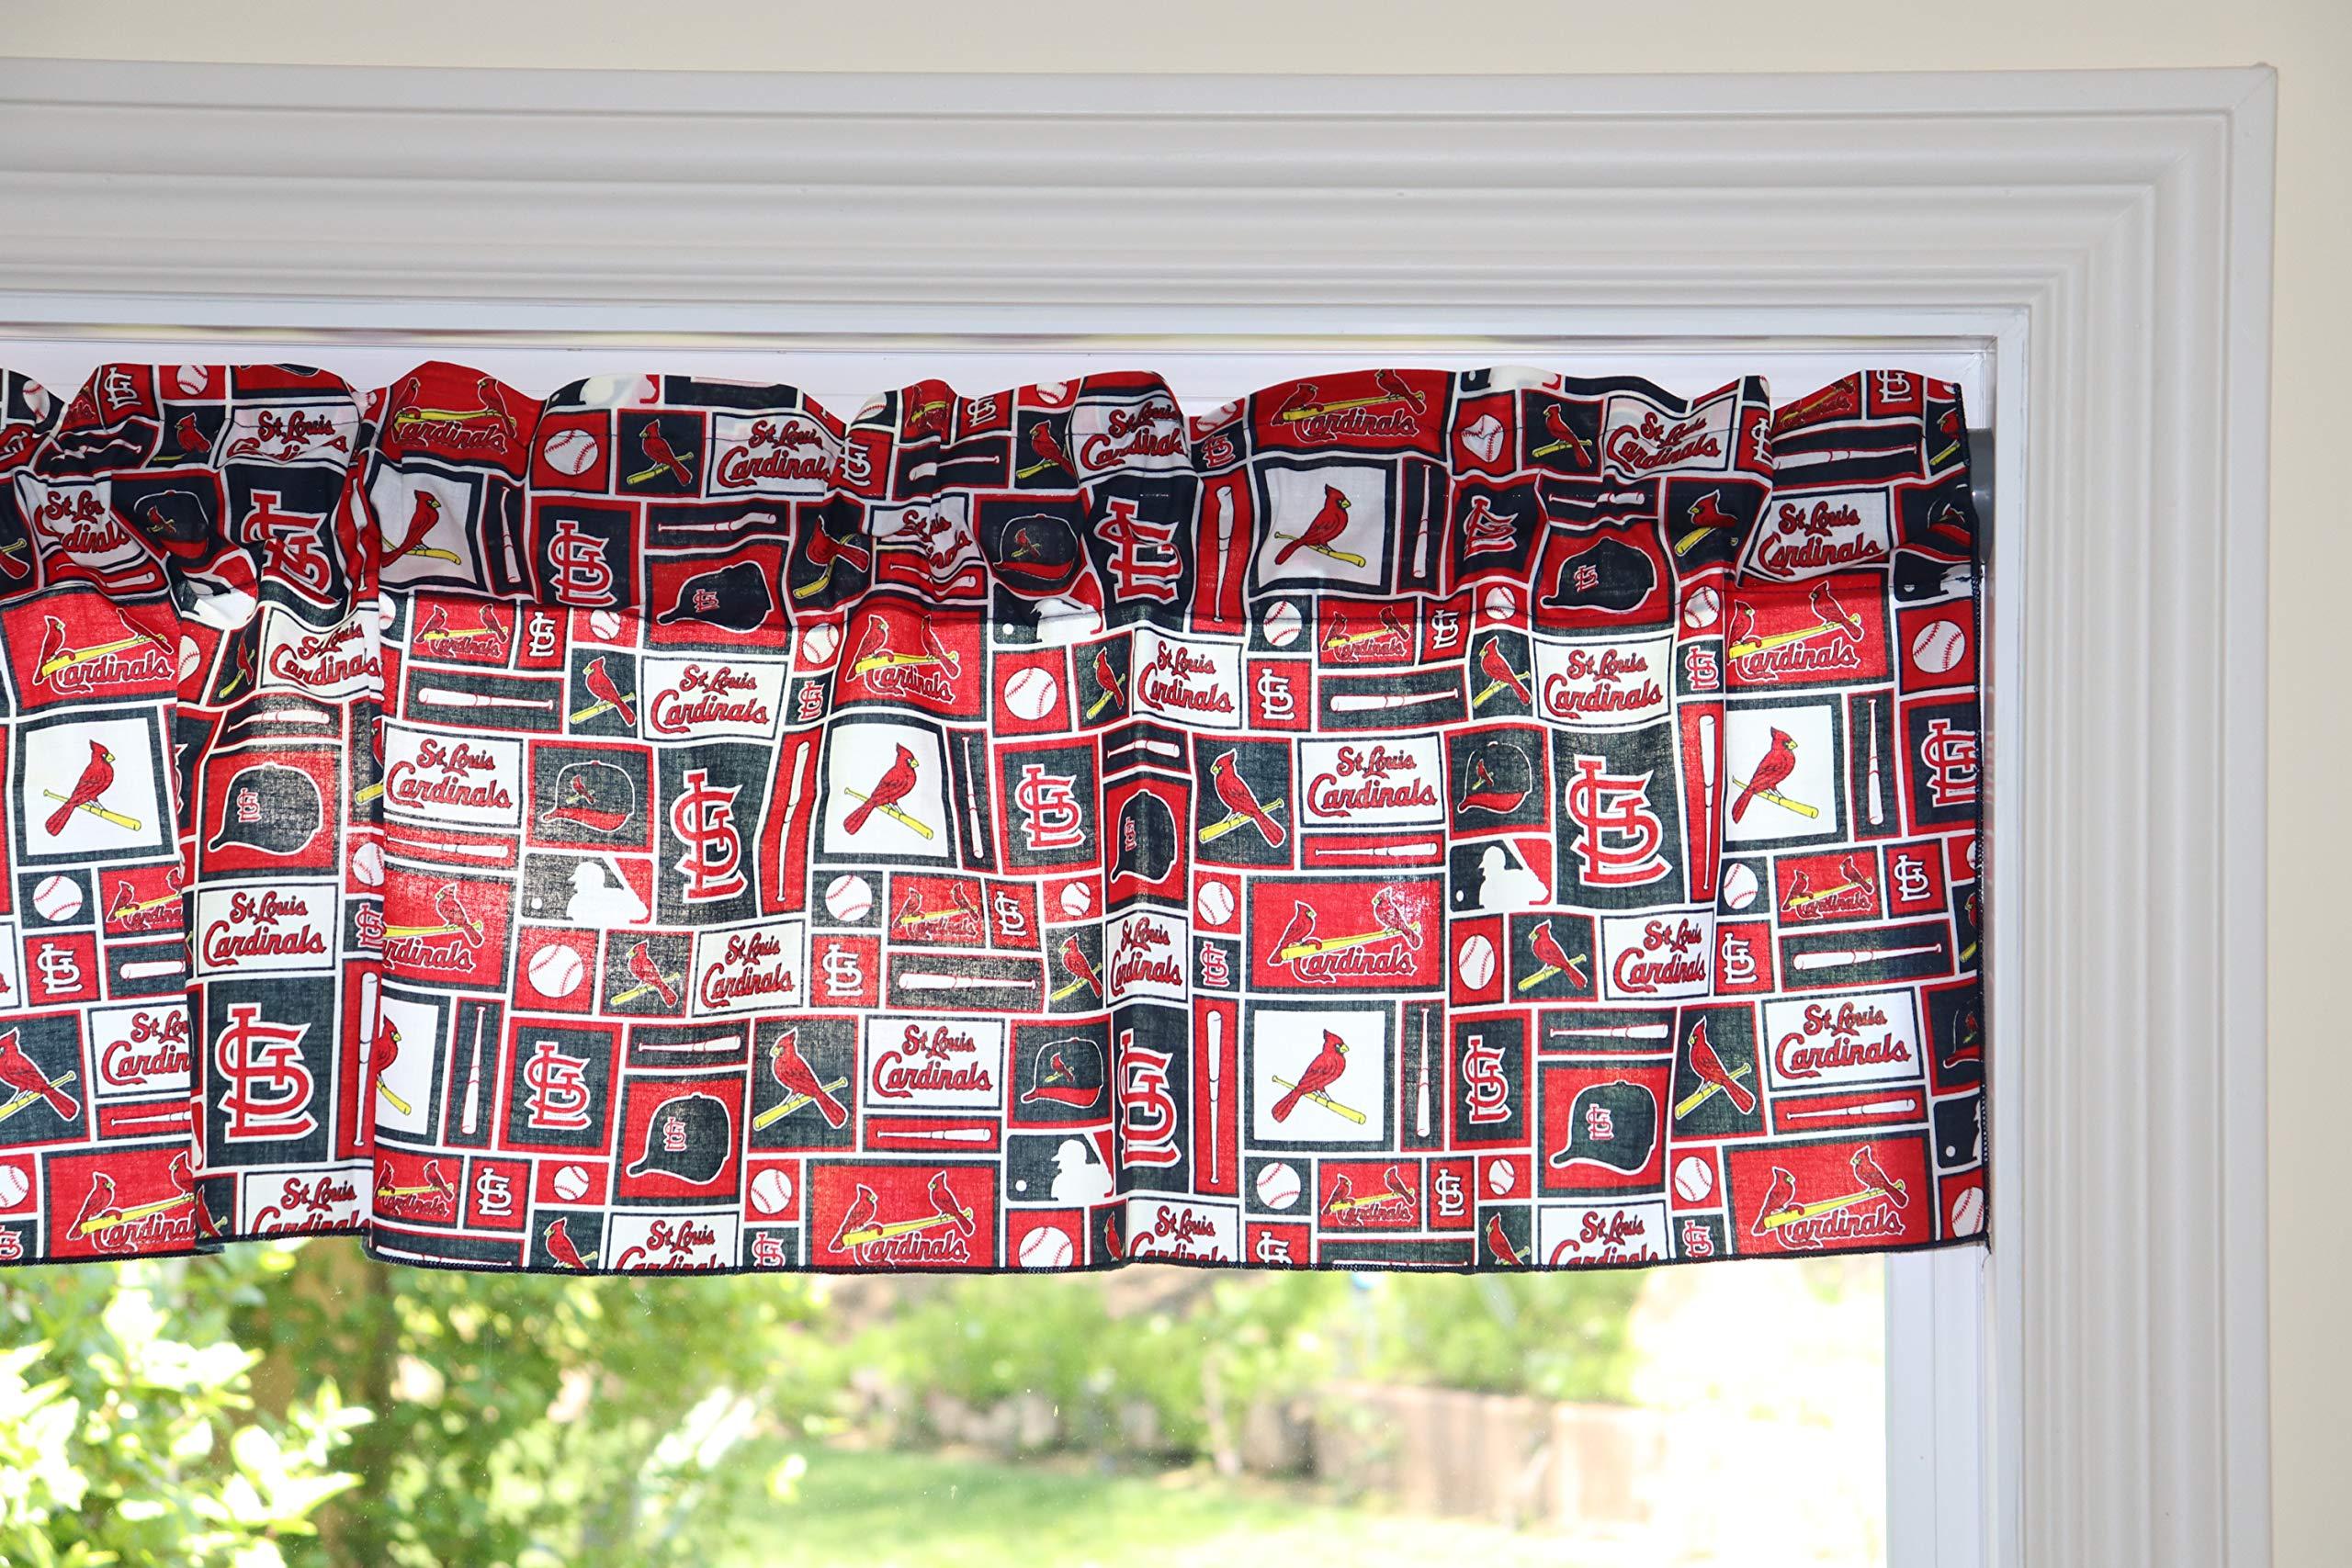 lovemyfabric Baseball Cotton Window Valance 100% Cotton Print MLB Sports Team St. Louis Cardinals Events Kitchen Dining Room Bedroom Window Decor (58'' Wide) (28'' Tall, Patchwork) by lovemyfabric